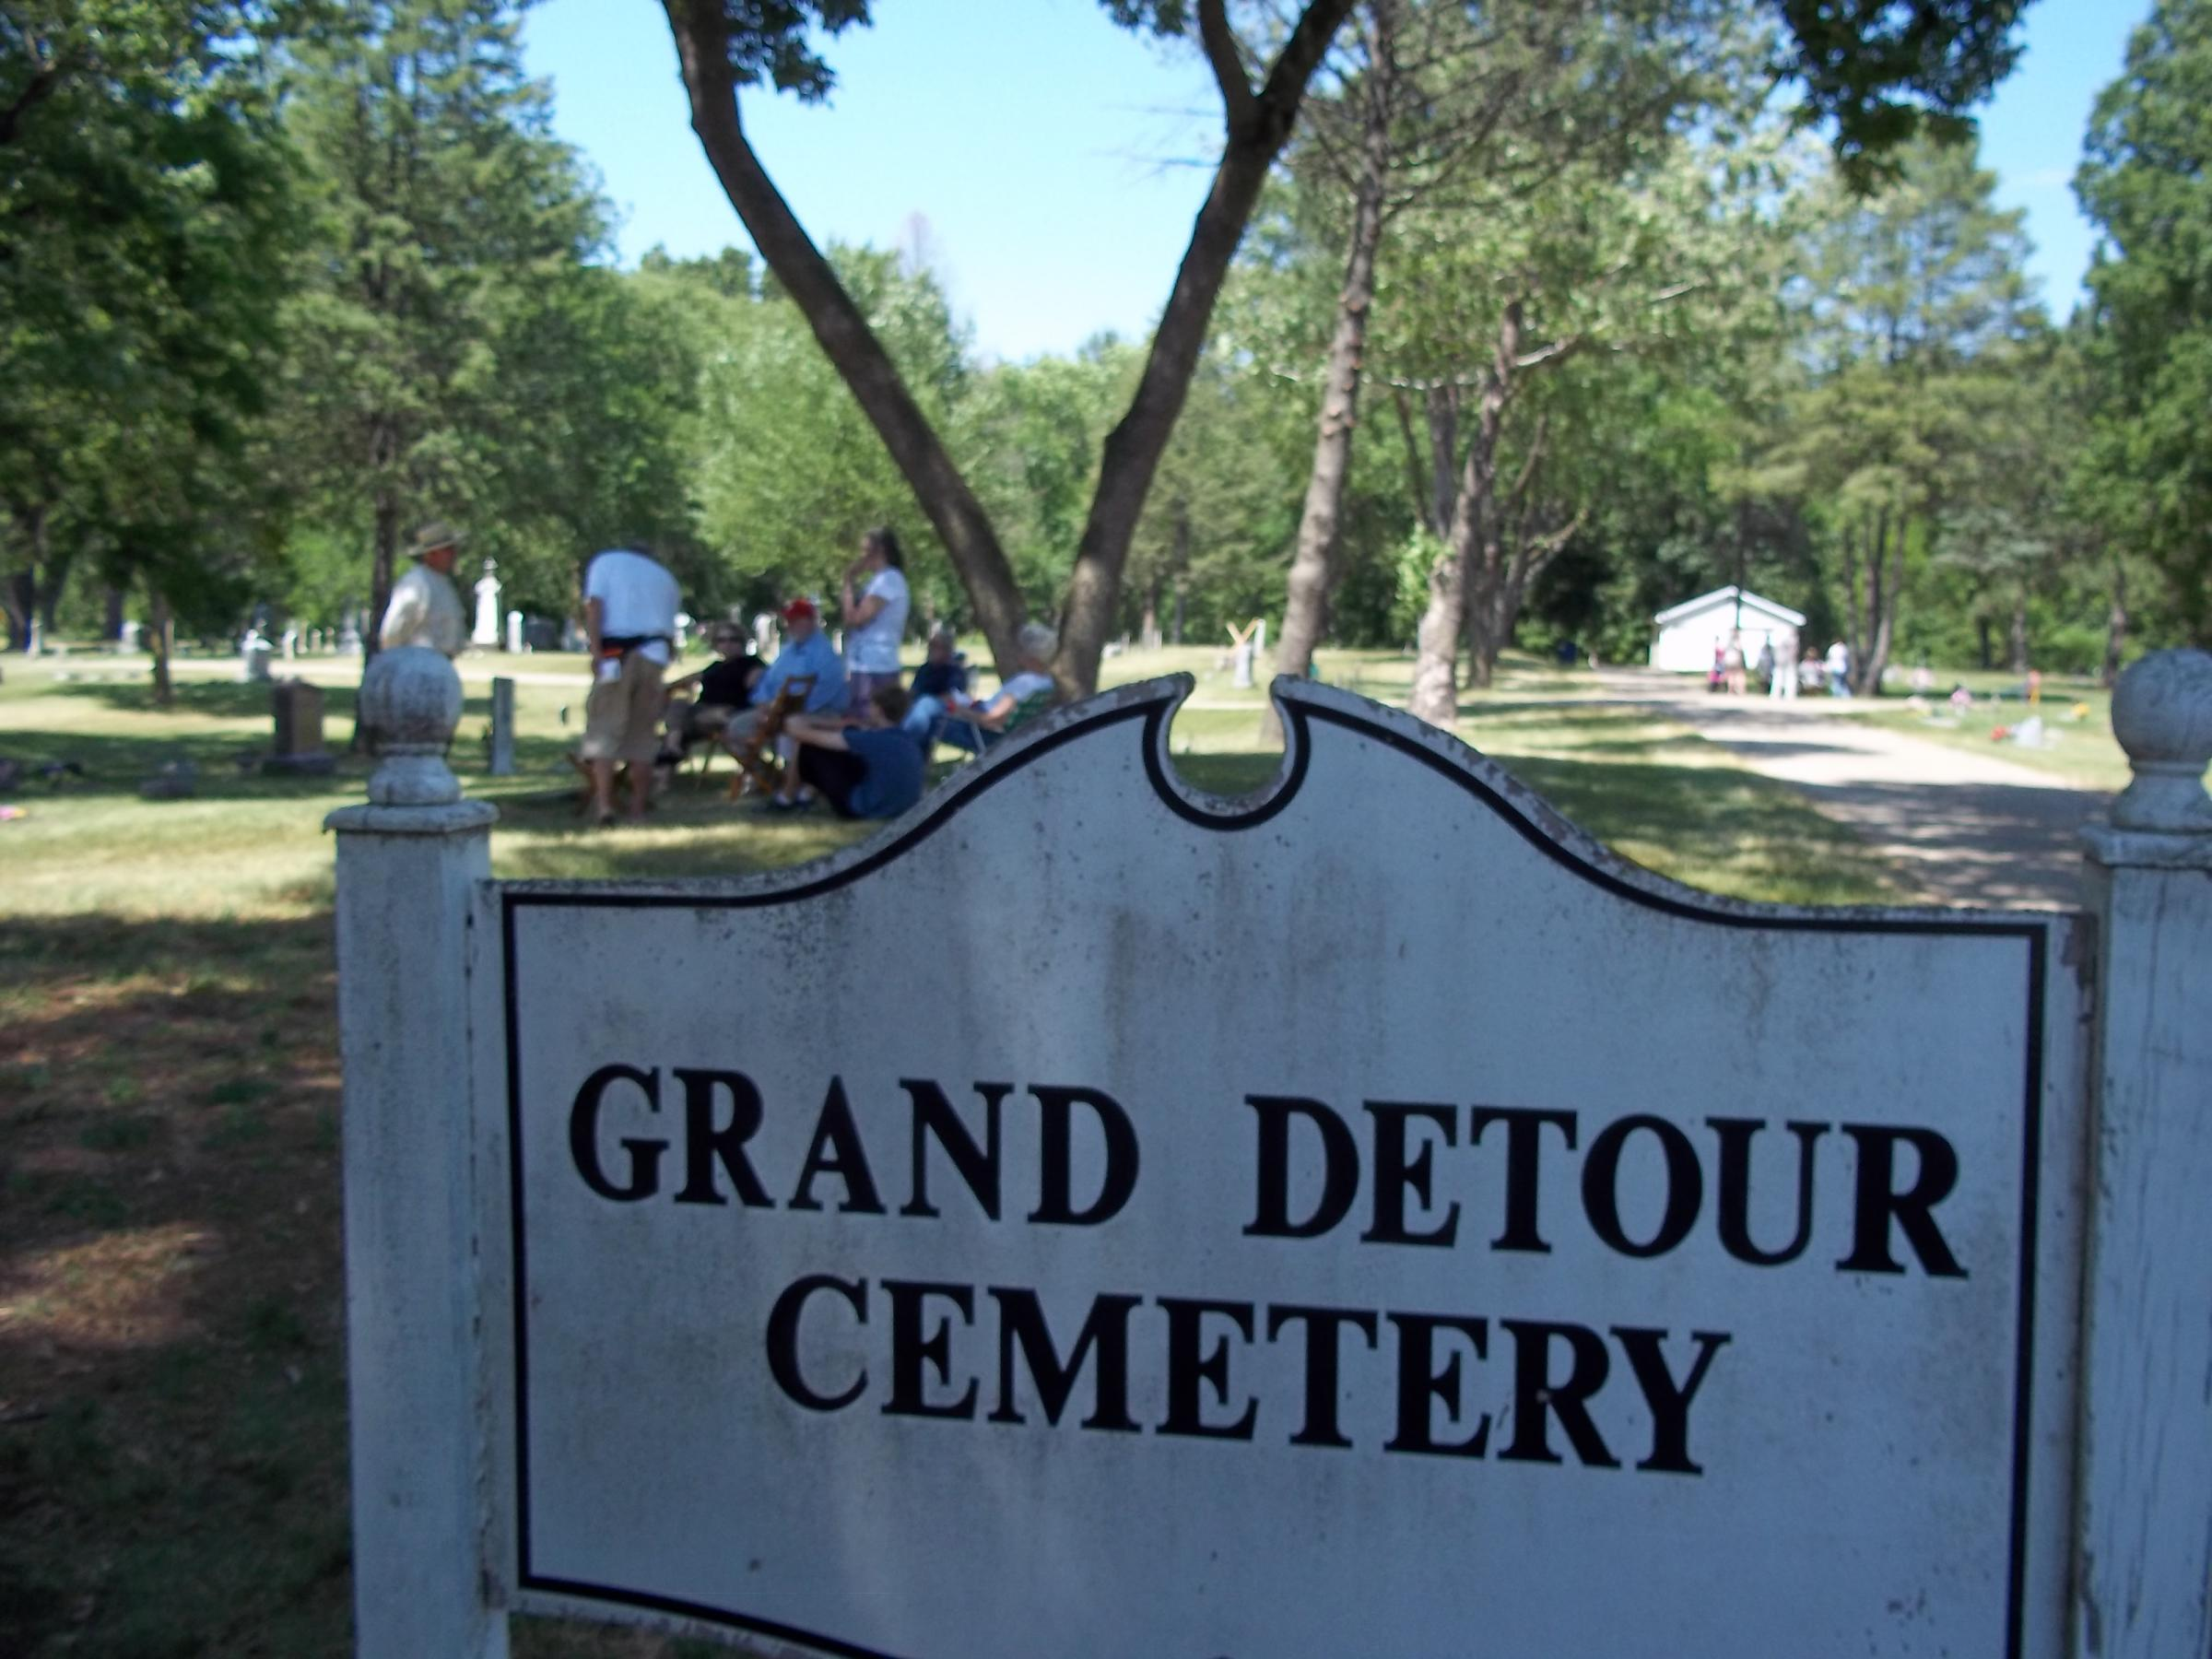 Grand Detour Celebrates History In Cemetery Wnij And Wniu